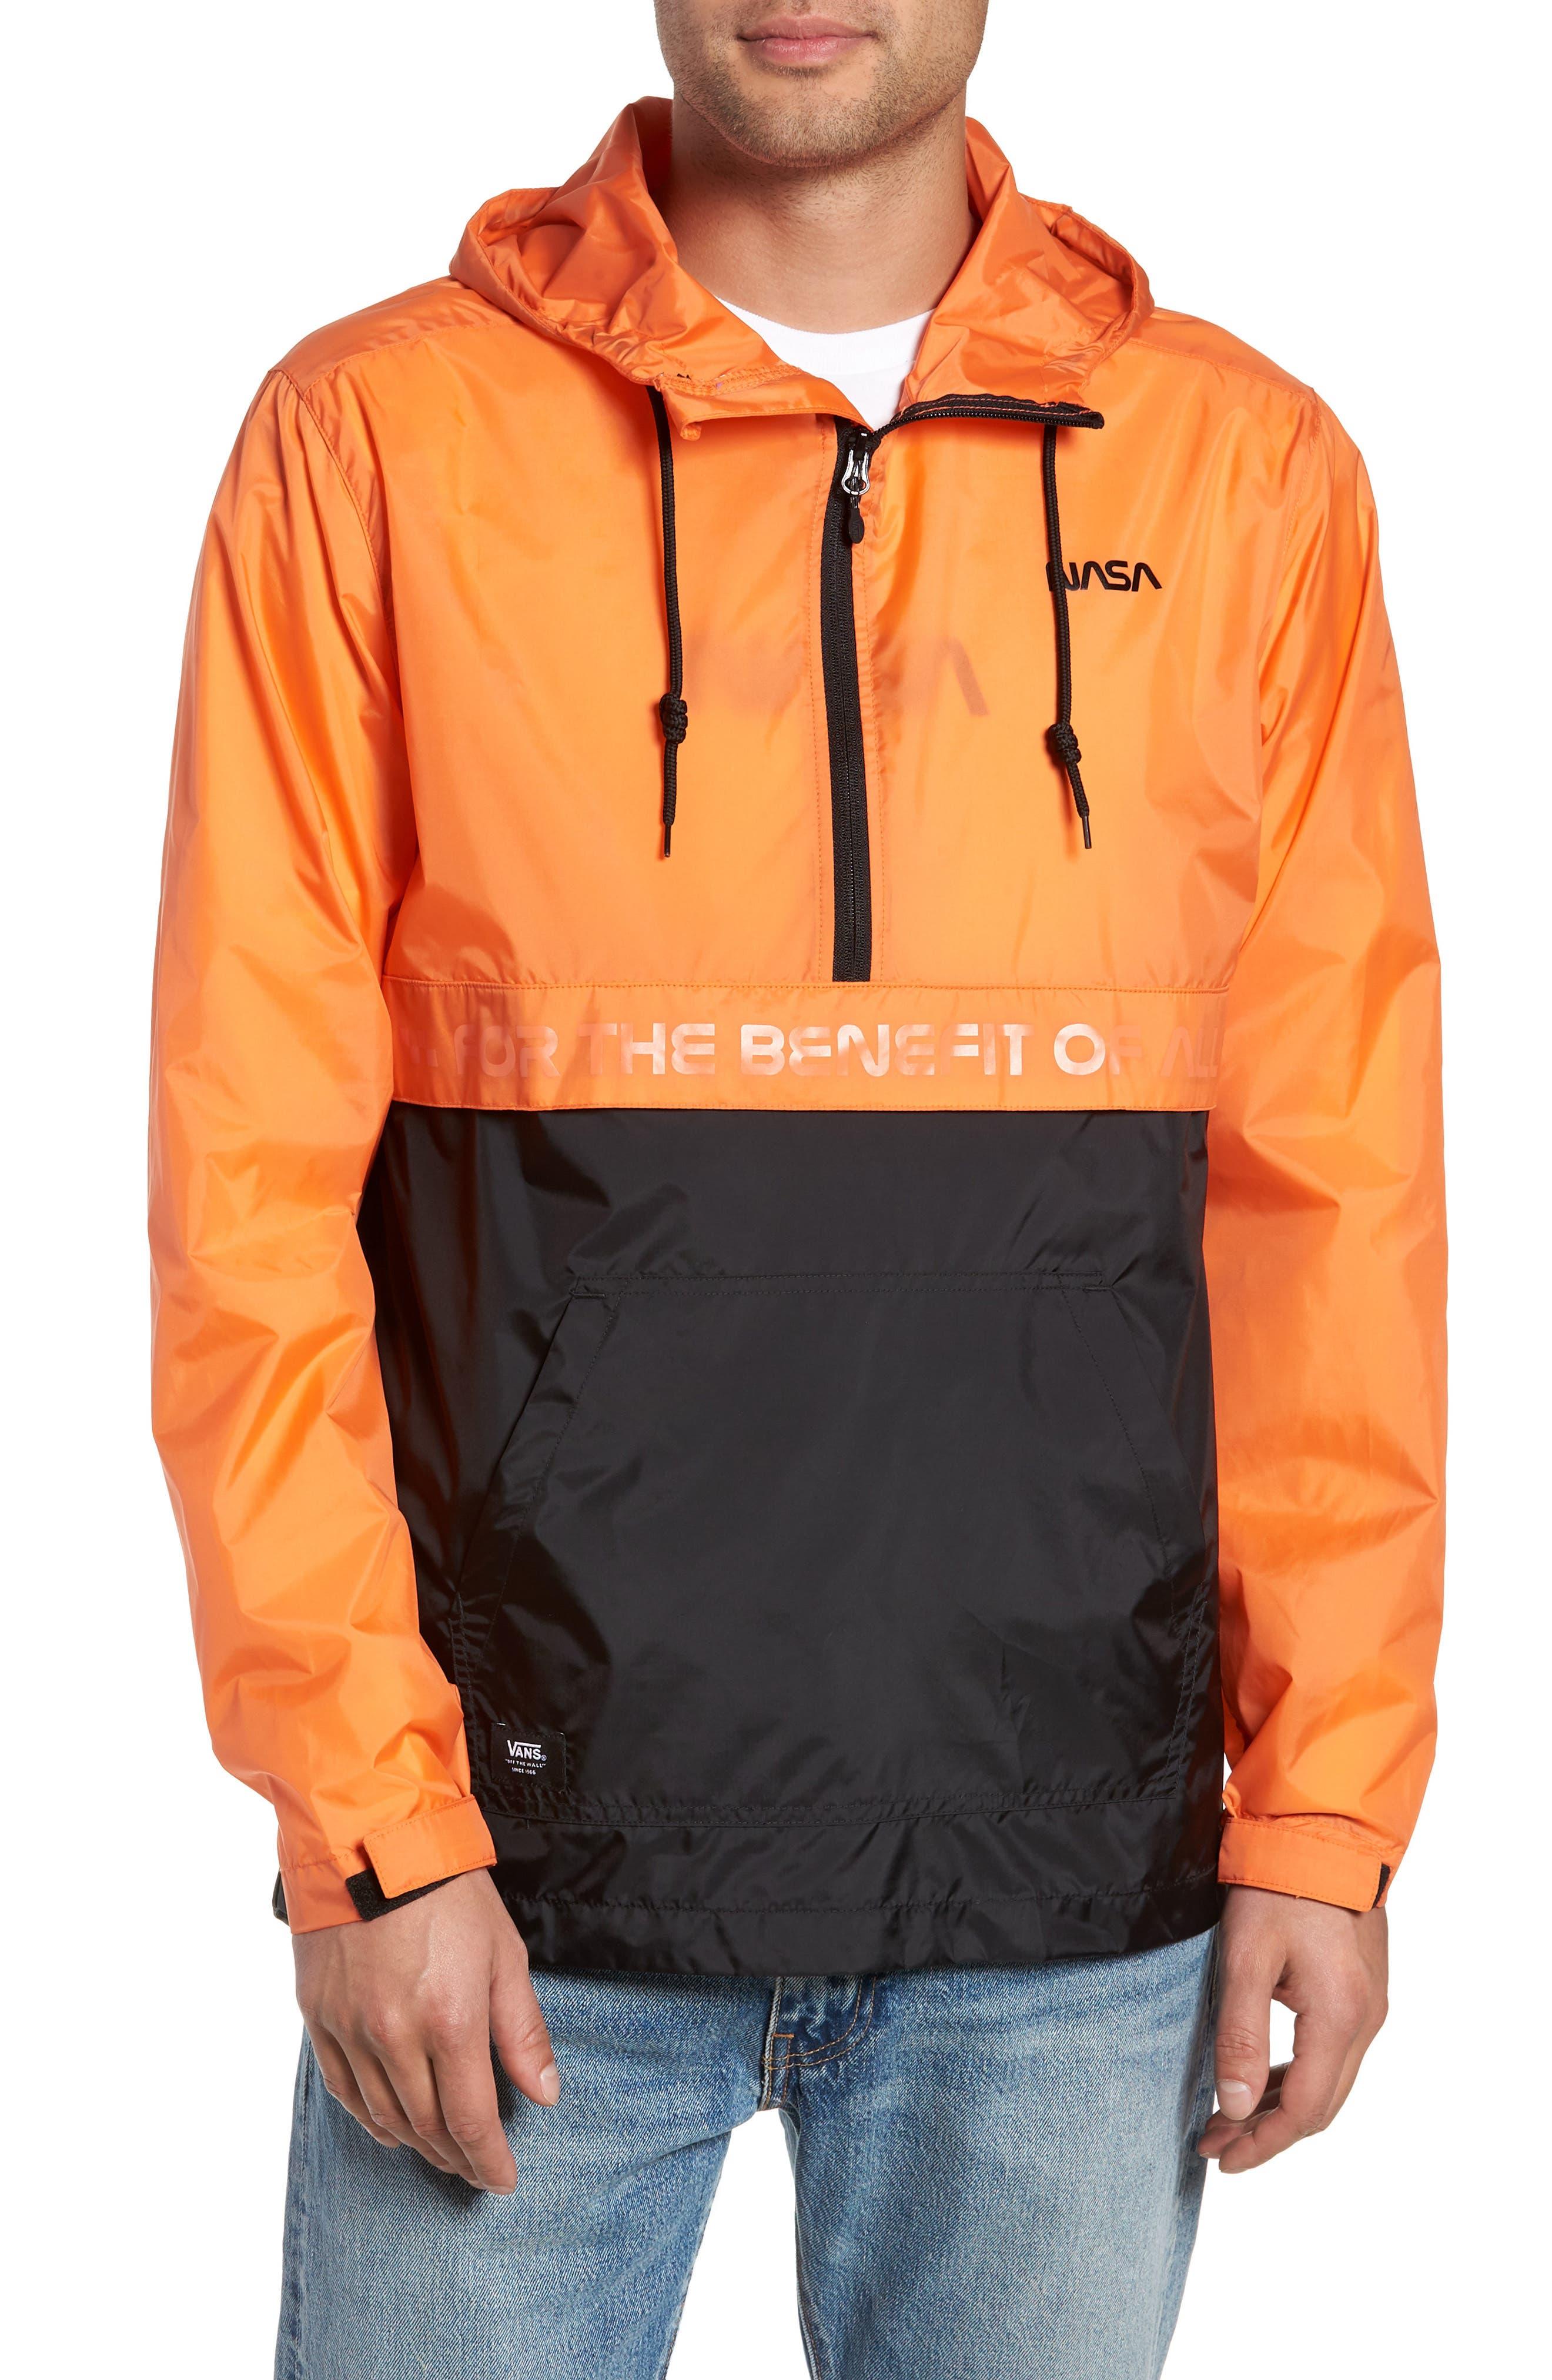 Vans Nasa Packable Water Resistant Anorak Jacket Nordstrom